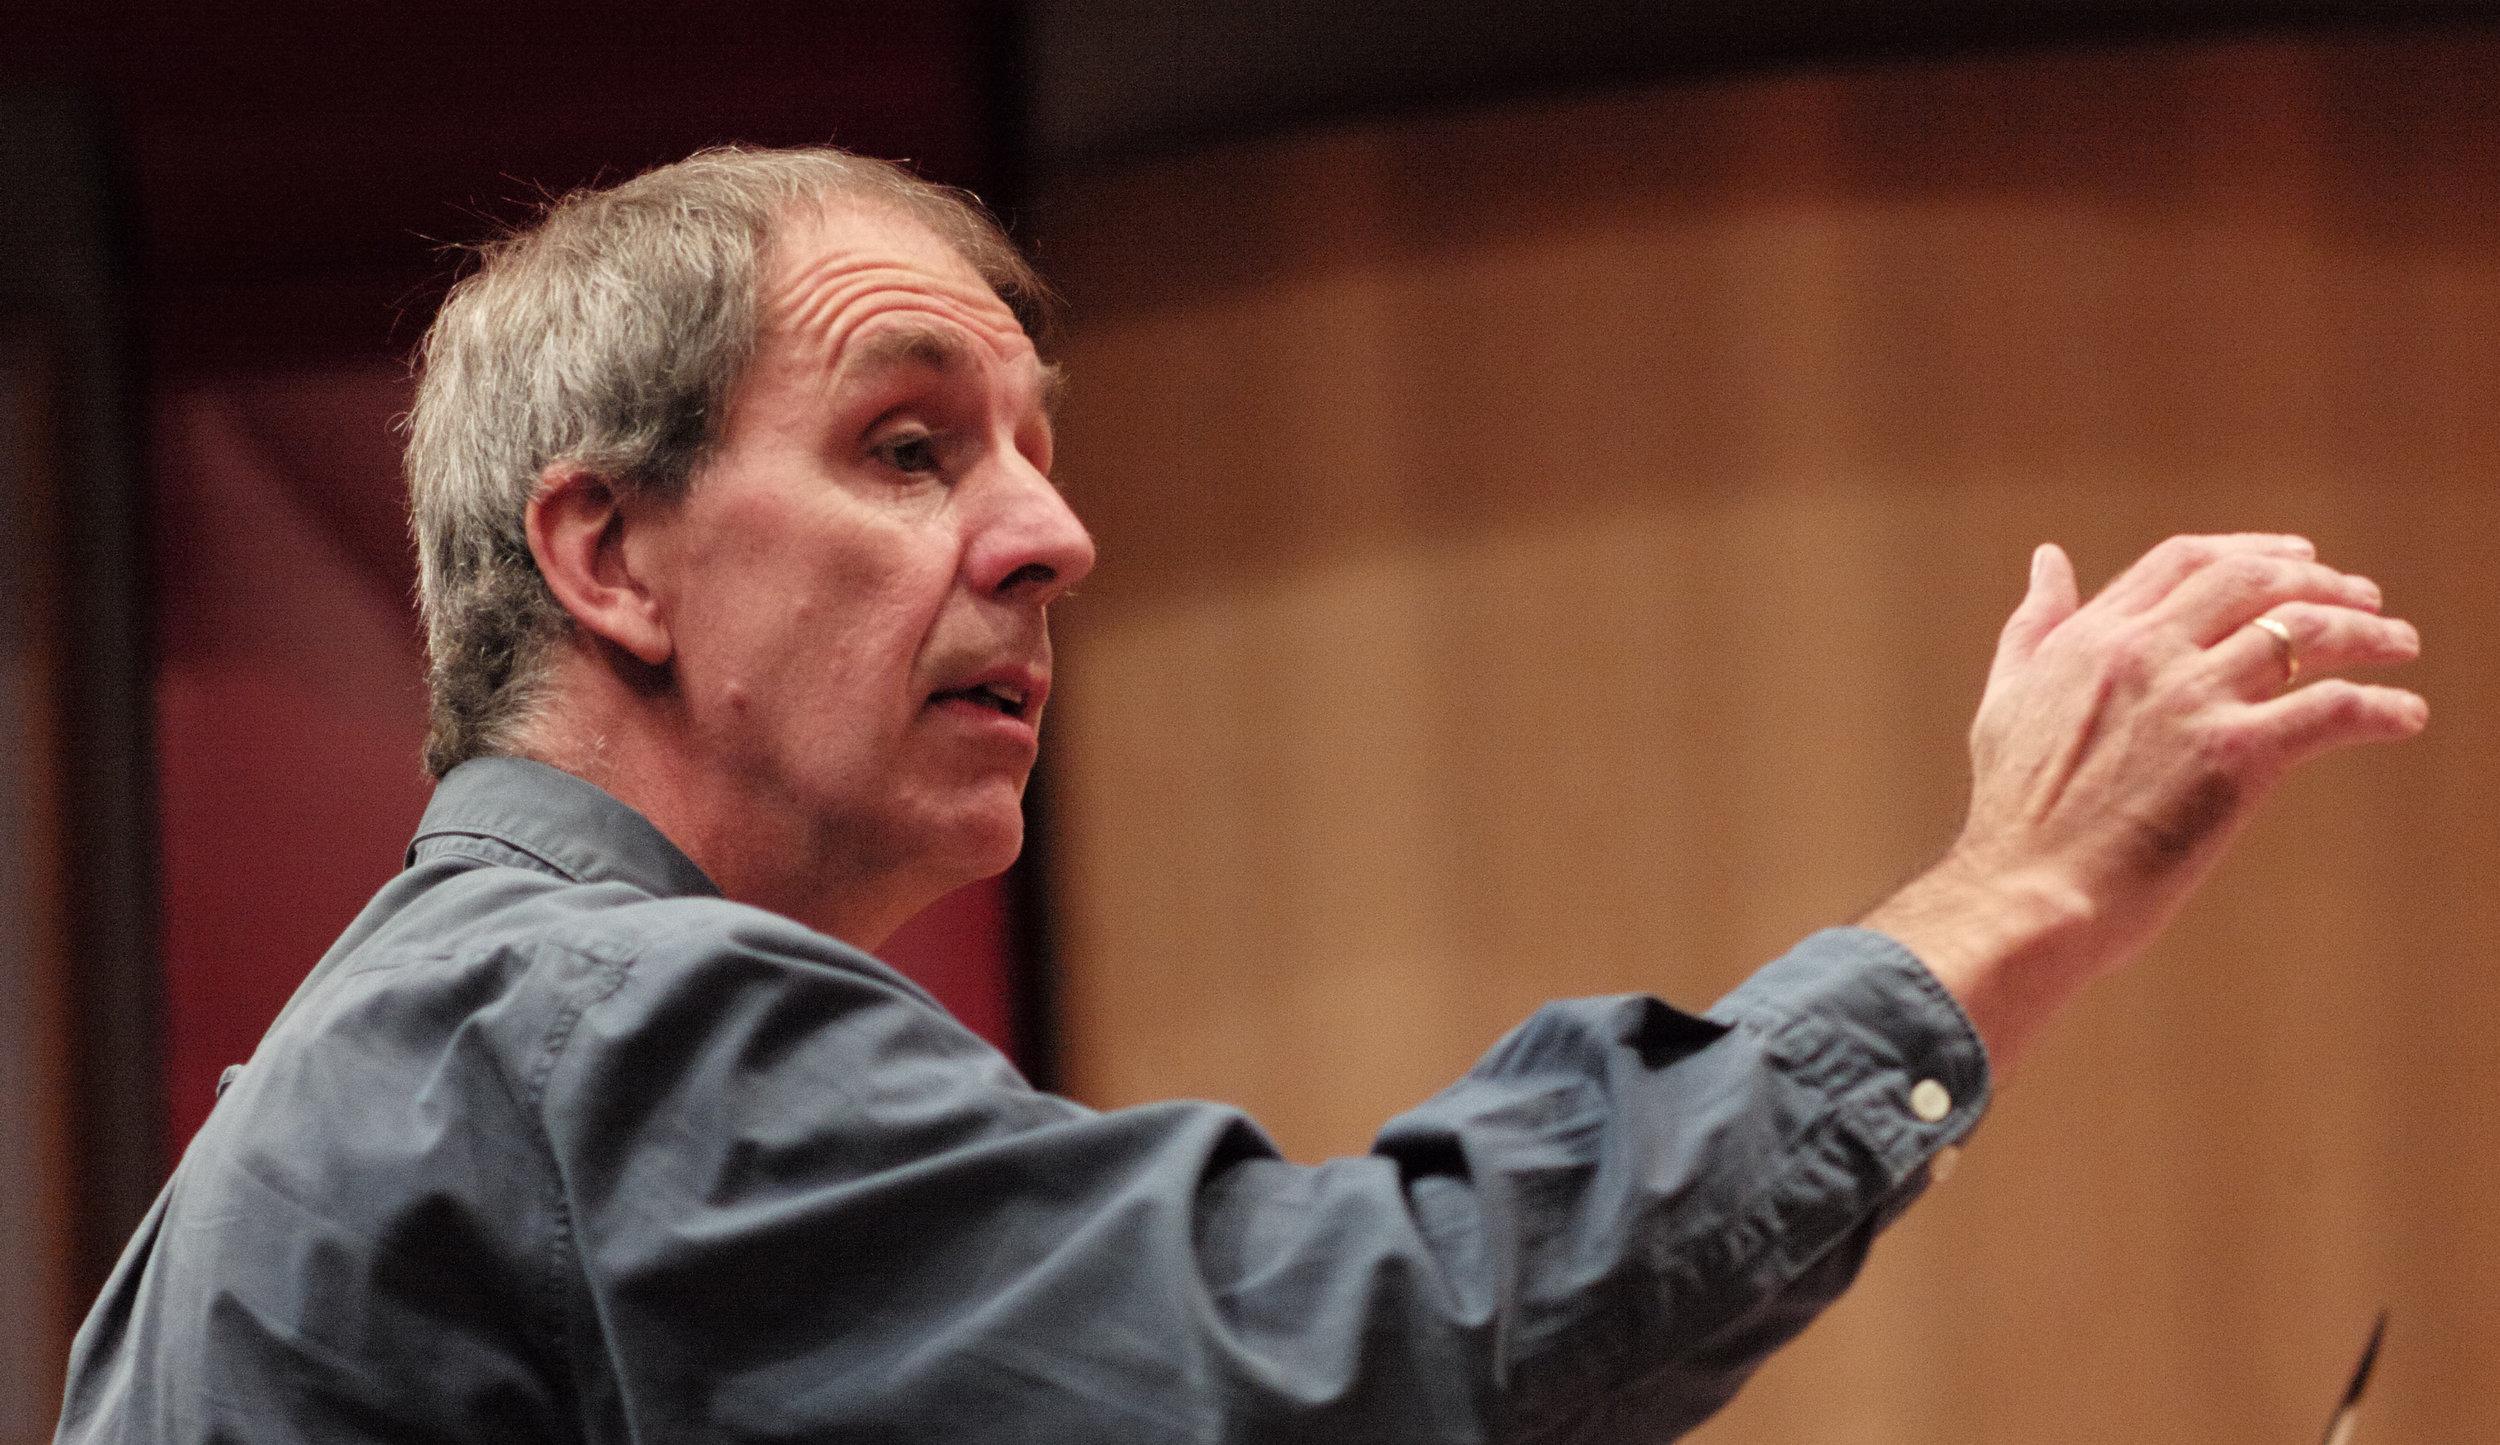 Richard Gwilt, composer of 'Fantasia for 'Cello Alone.